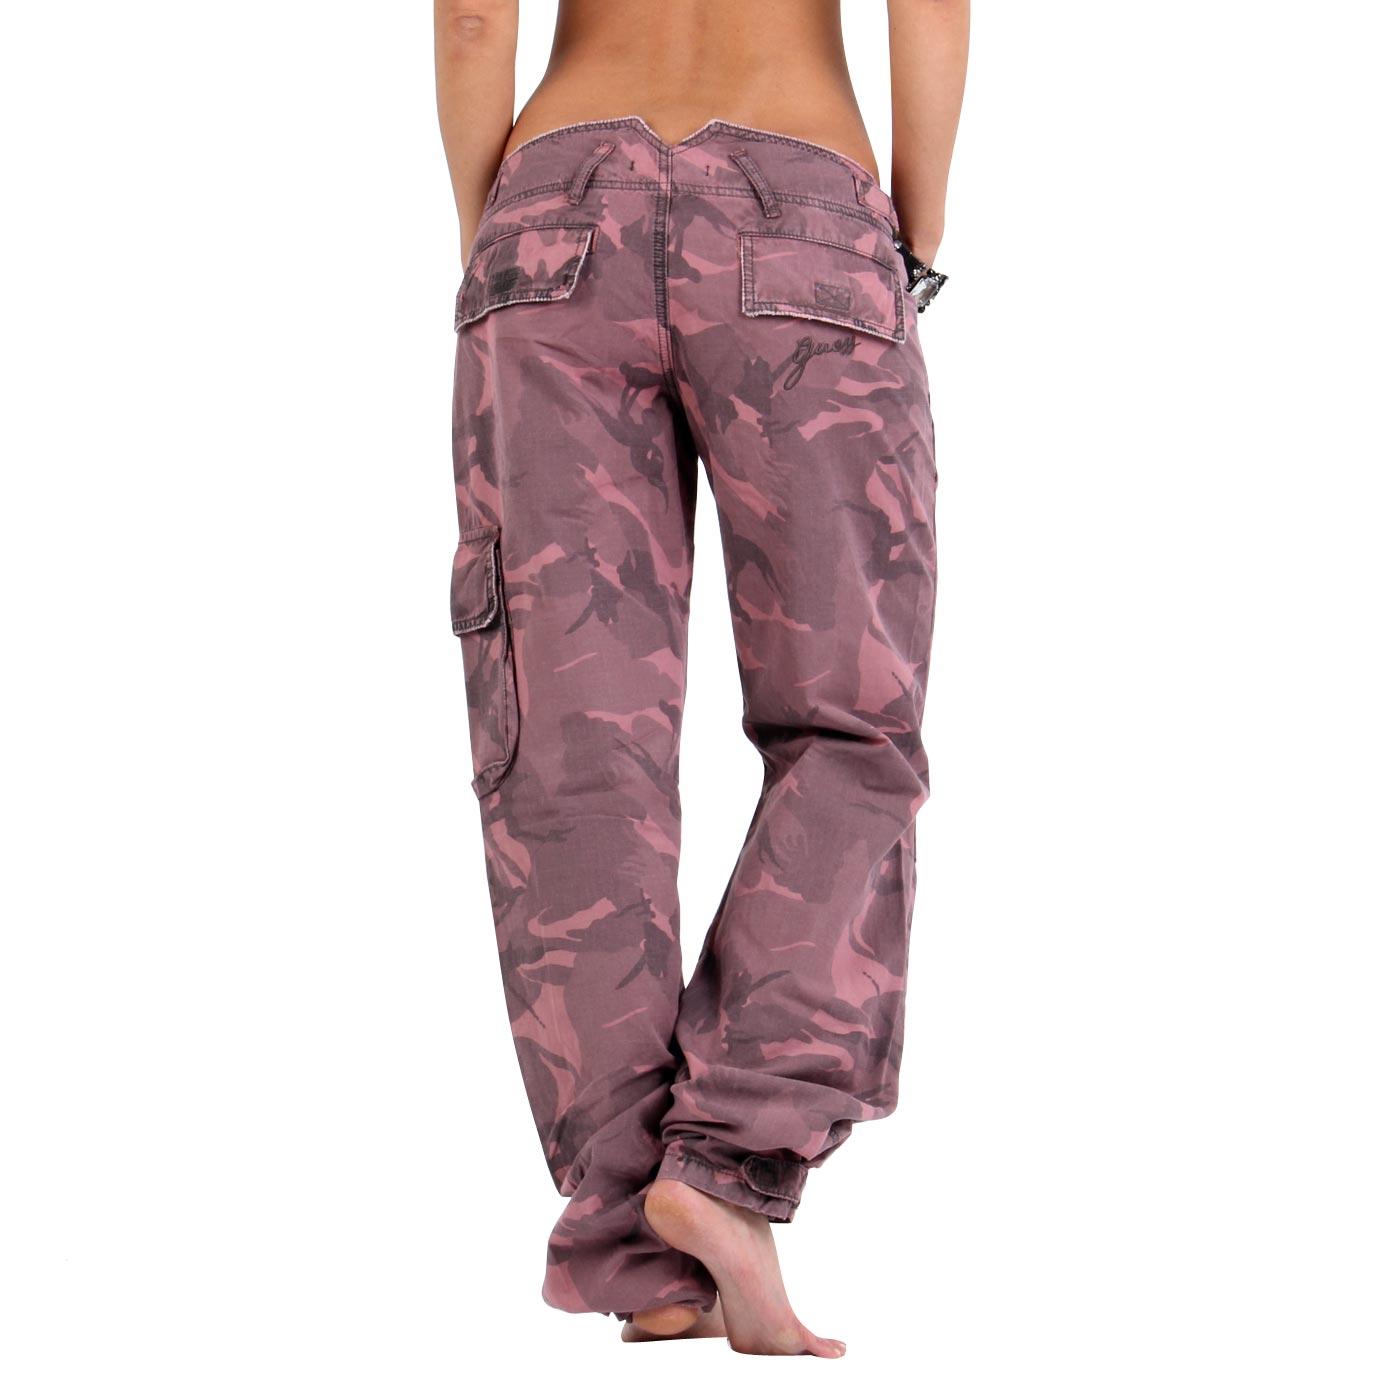 guess jeans damen hose shadow camouflage pink gwb142 ebay. Black Bedroom Furniture Sets. Home Design Ideas